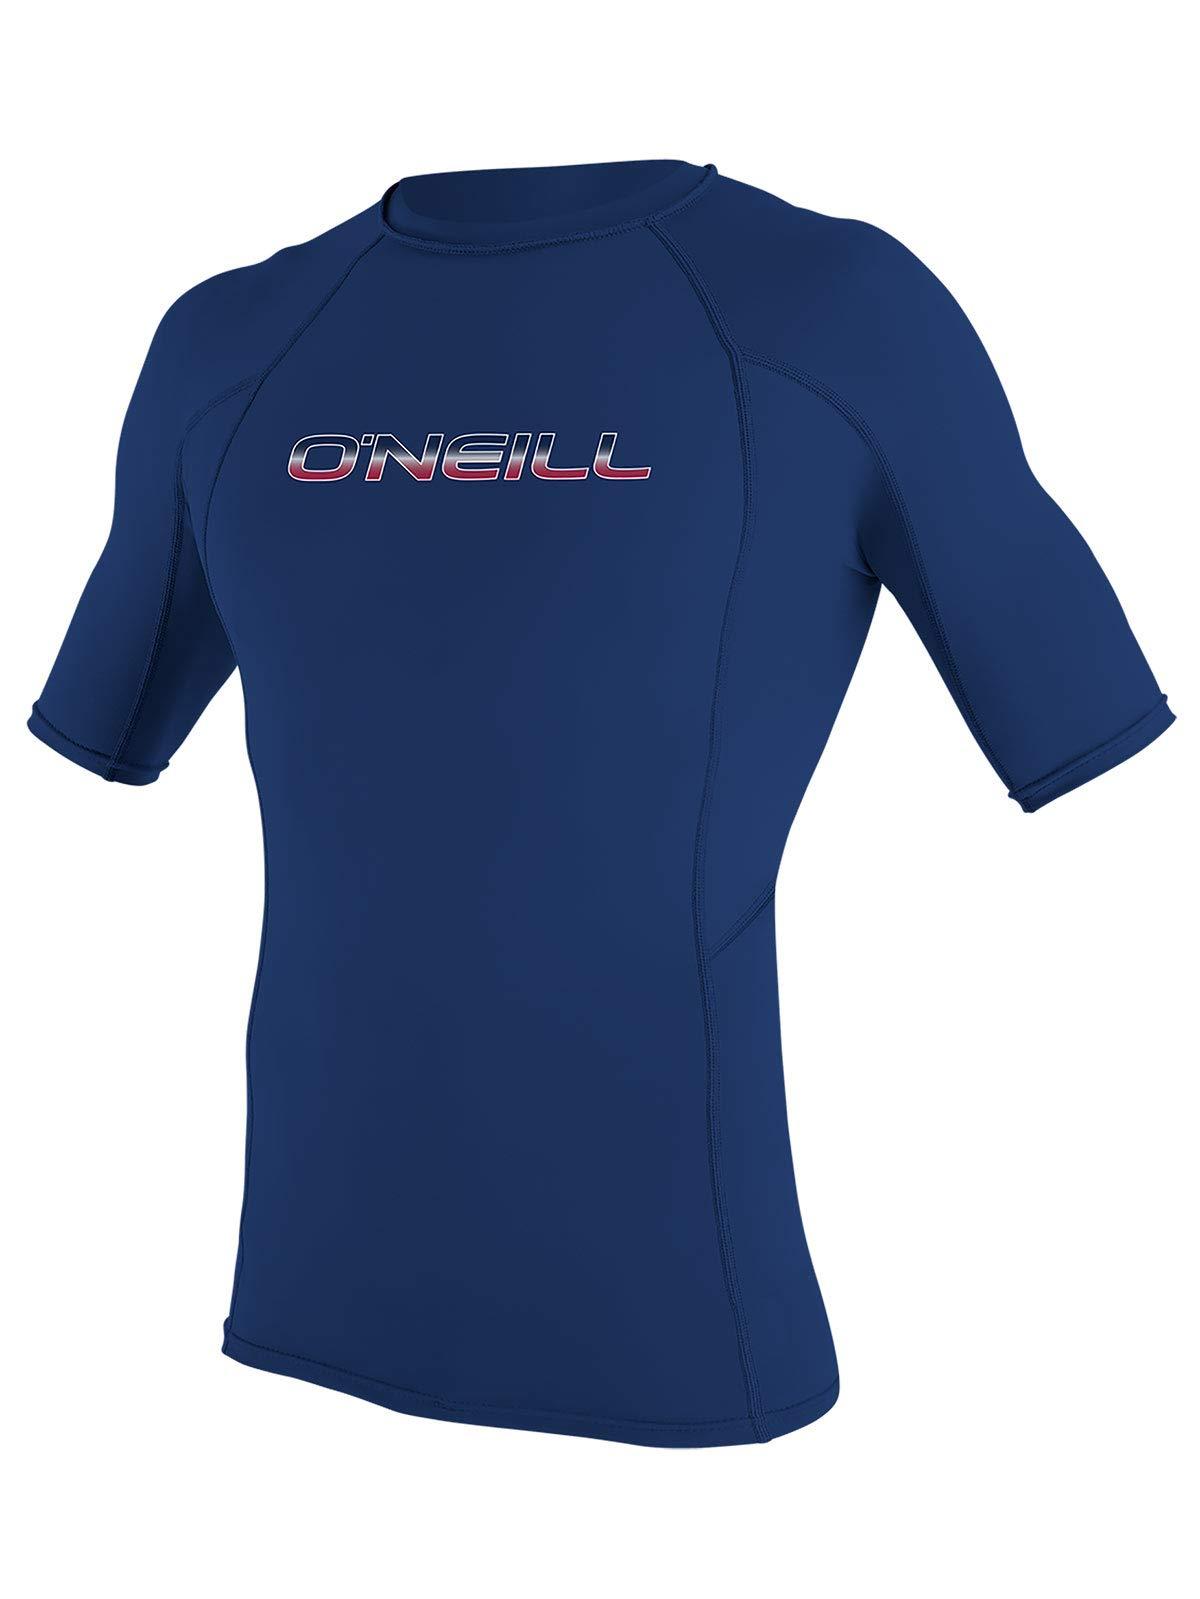 O'Neill Men's Basic Skins Short Sleeve Rashguard (Navy (3341IB), 4X-Large)